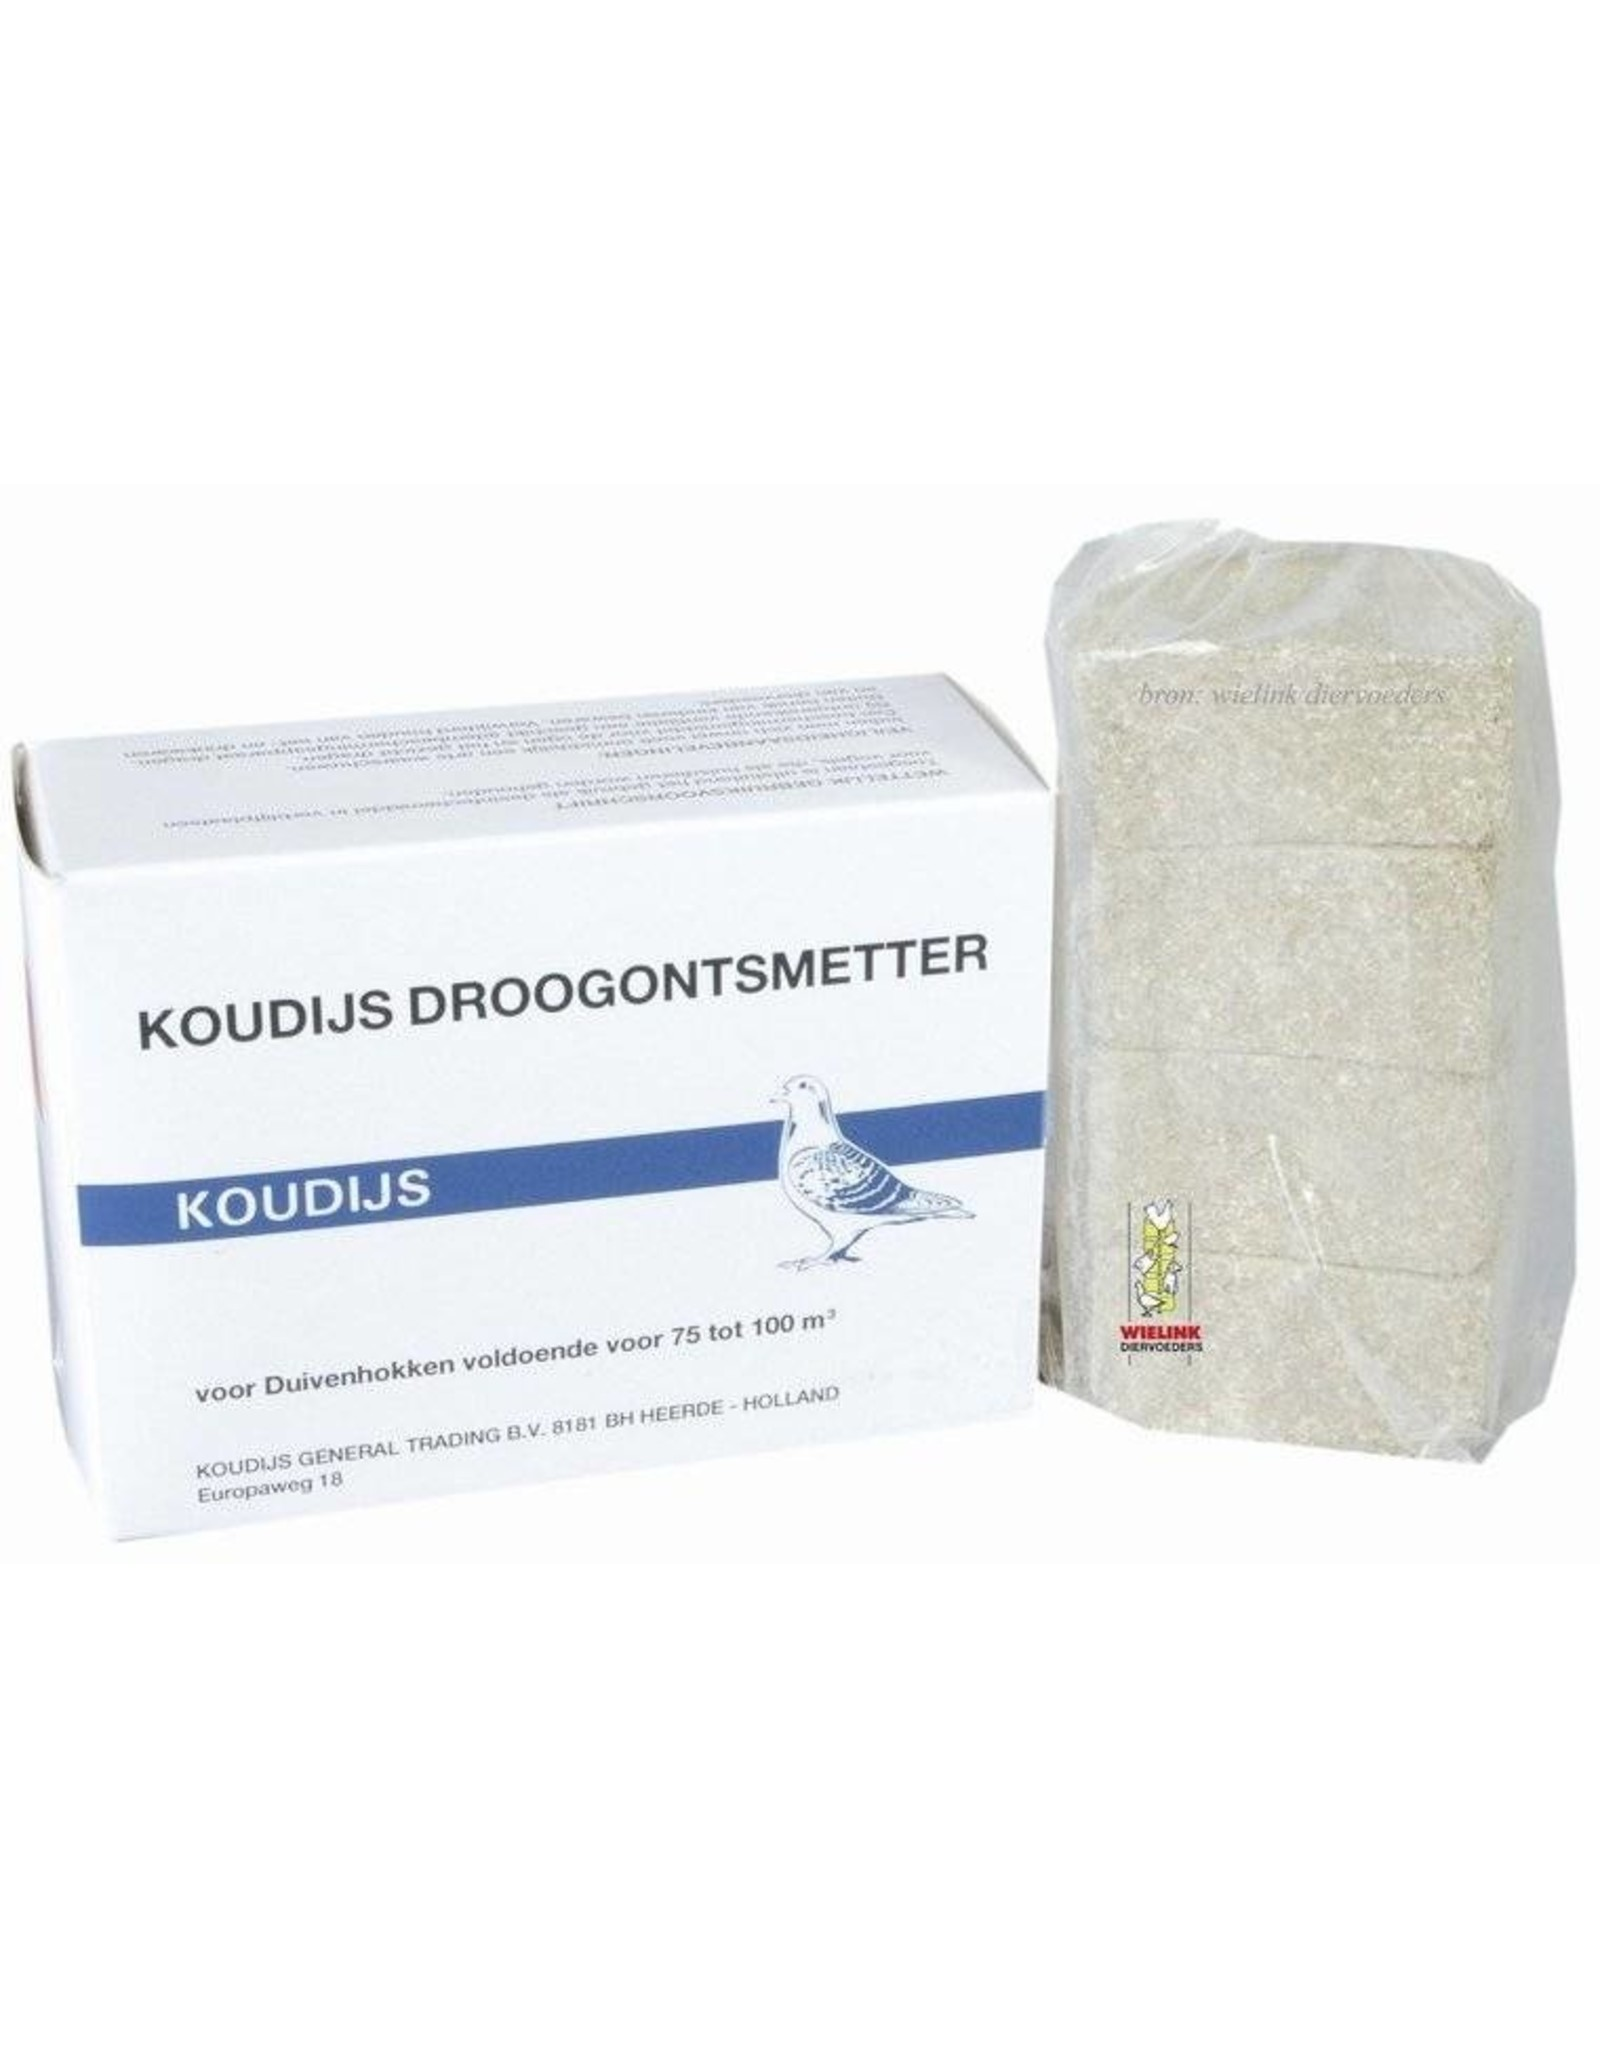 Koudijs Droogontsmetter - 1 Stuks